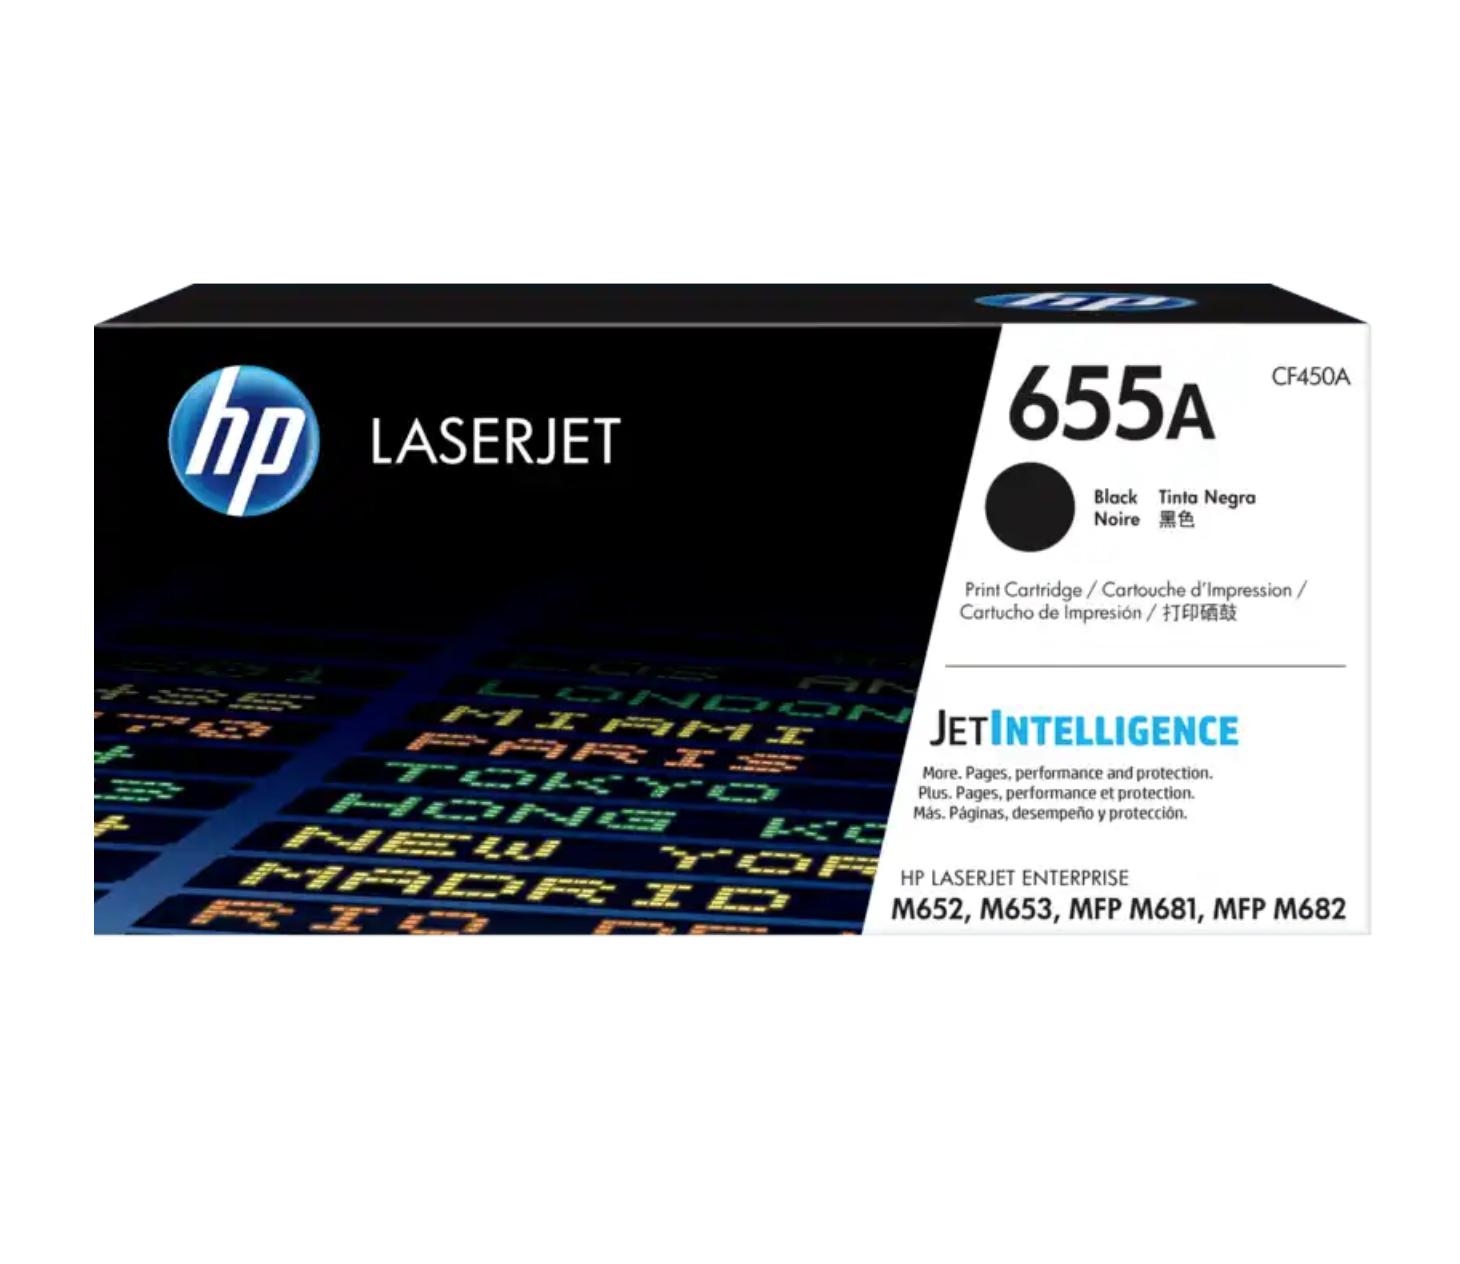 HP 655A 黑色原廠 LaserJet 碳粉 CF450A